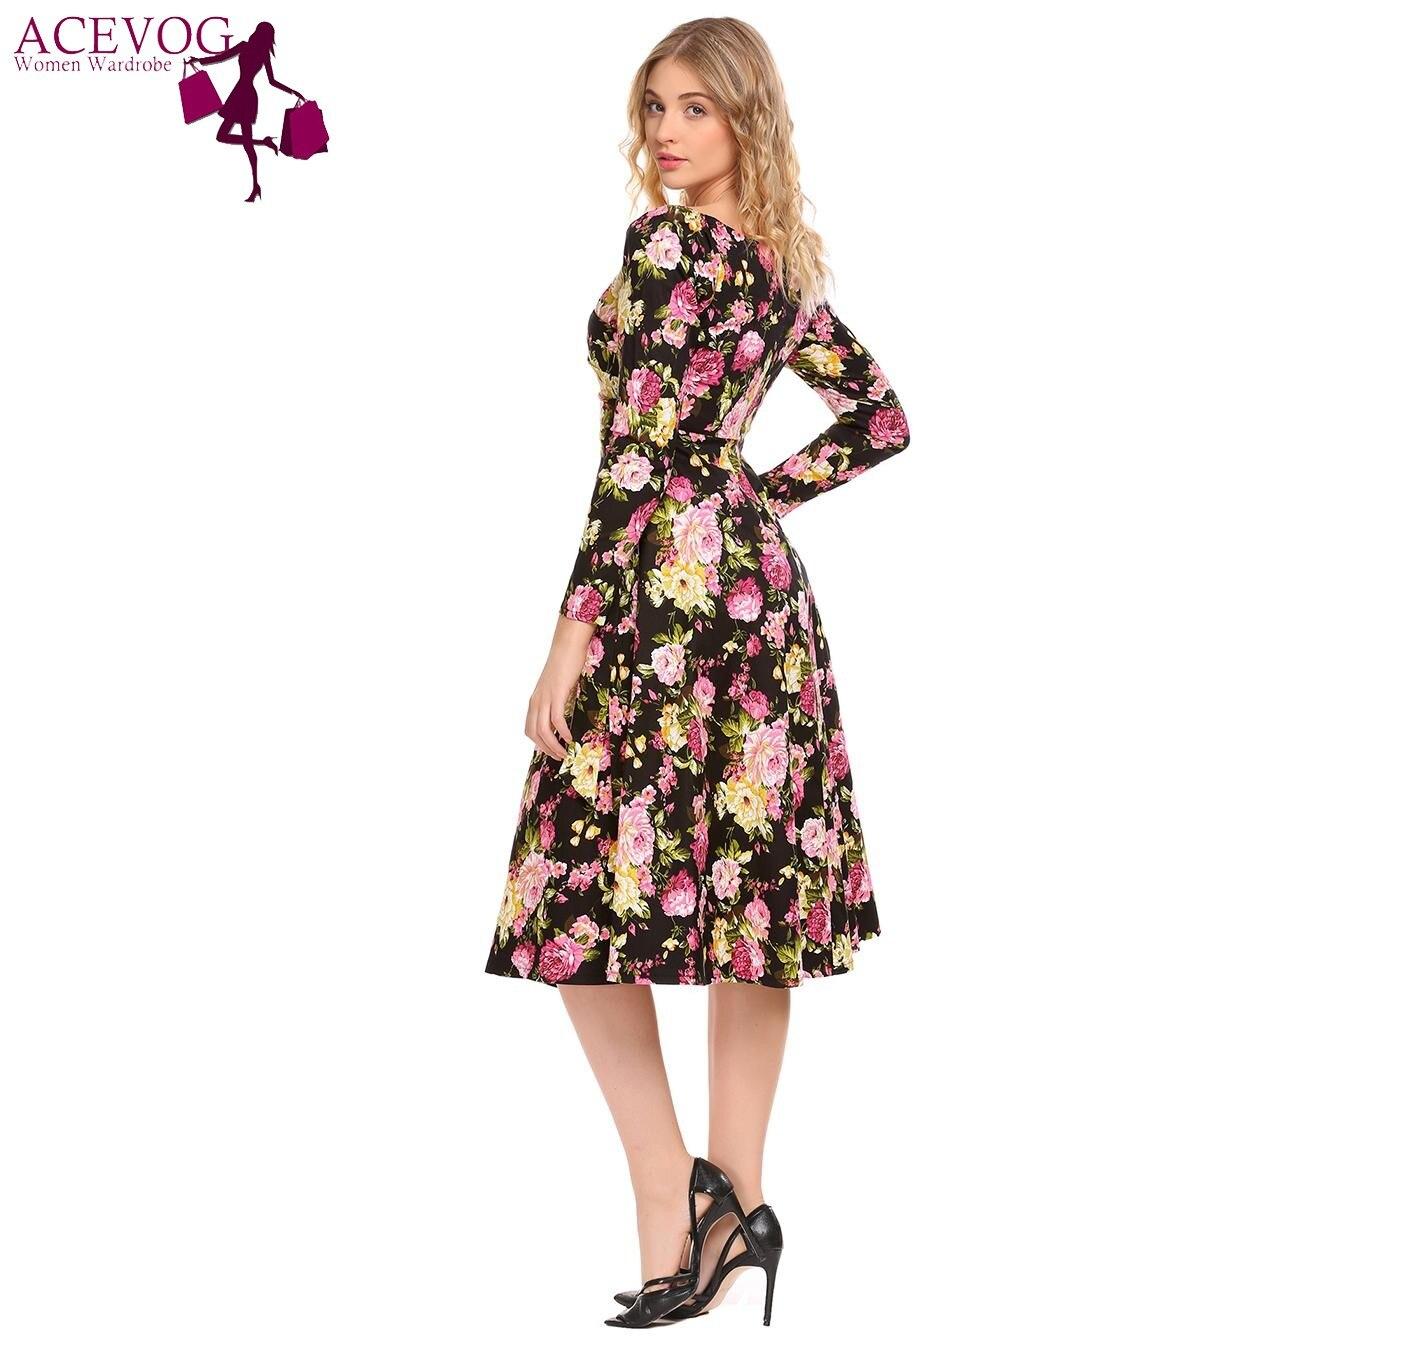 b0798225f236 ACEVOG Women Swing Dress Vintage Wrap Split Spring Autumn V Neck Long Sleeve  Lace Up High Waist Printed Party Dresses Vestidos